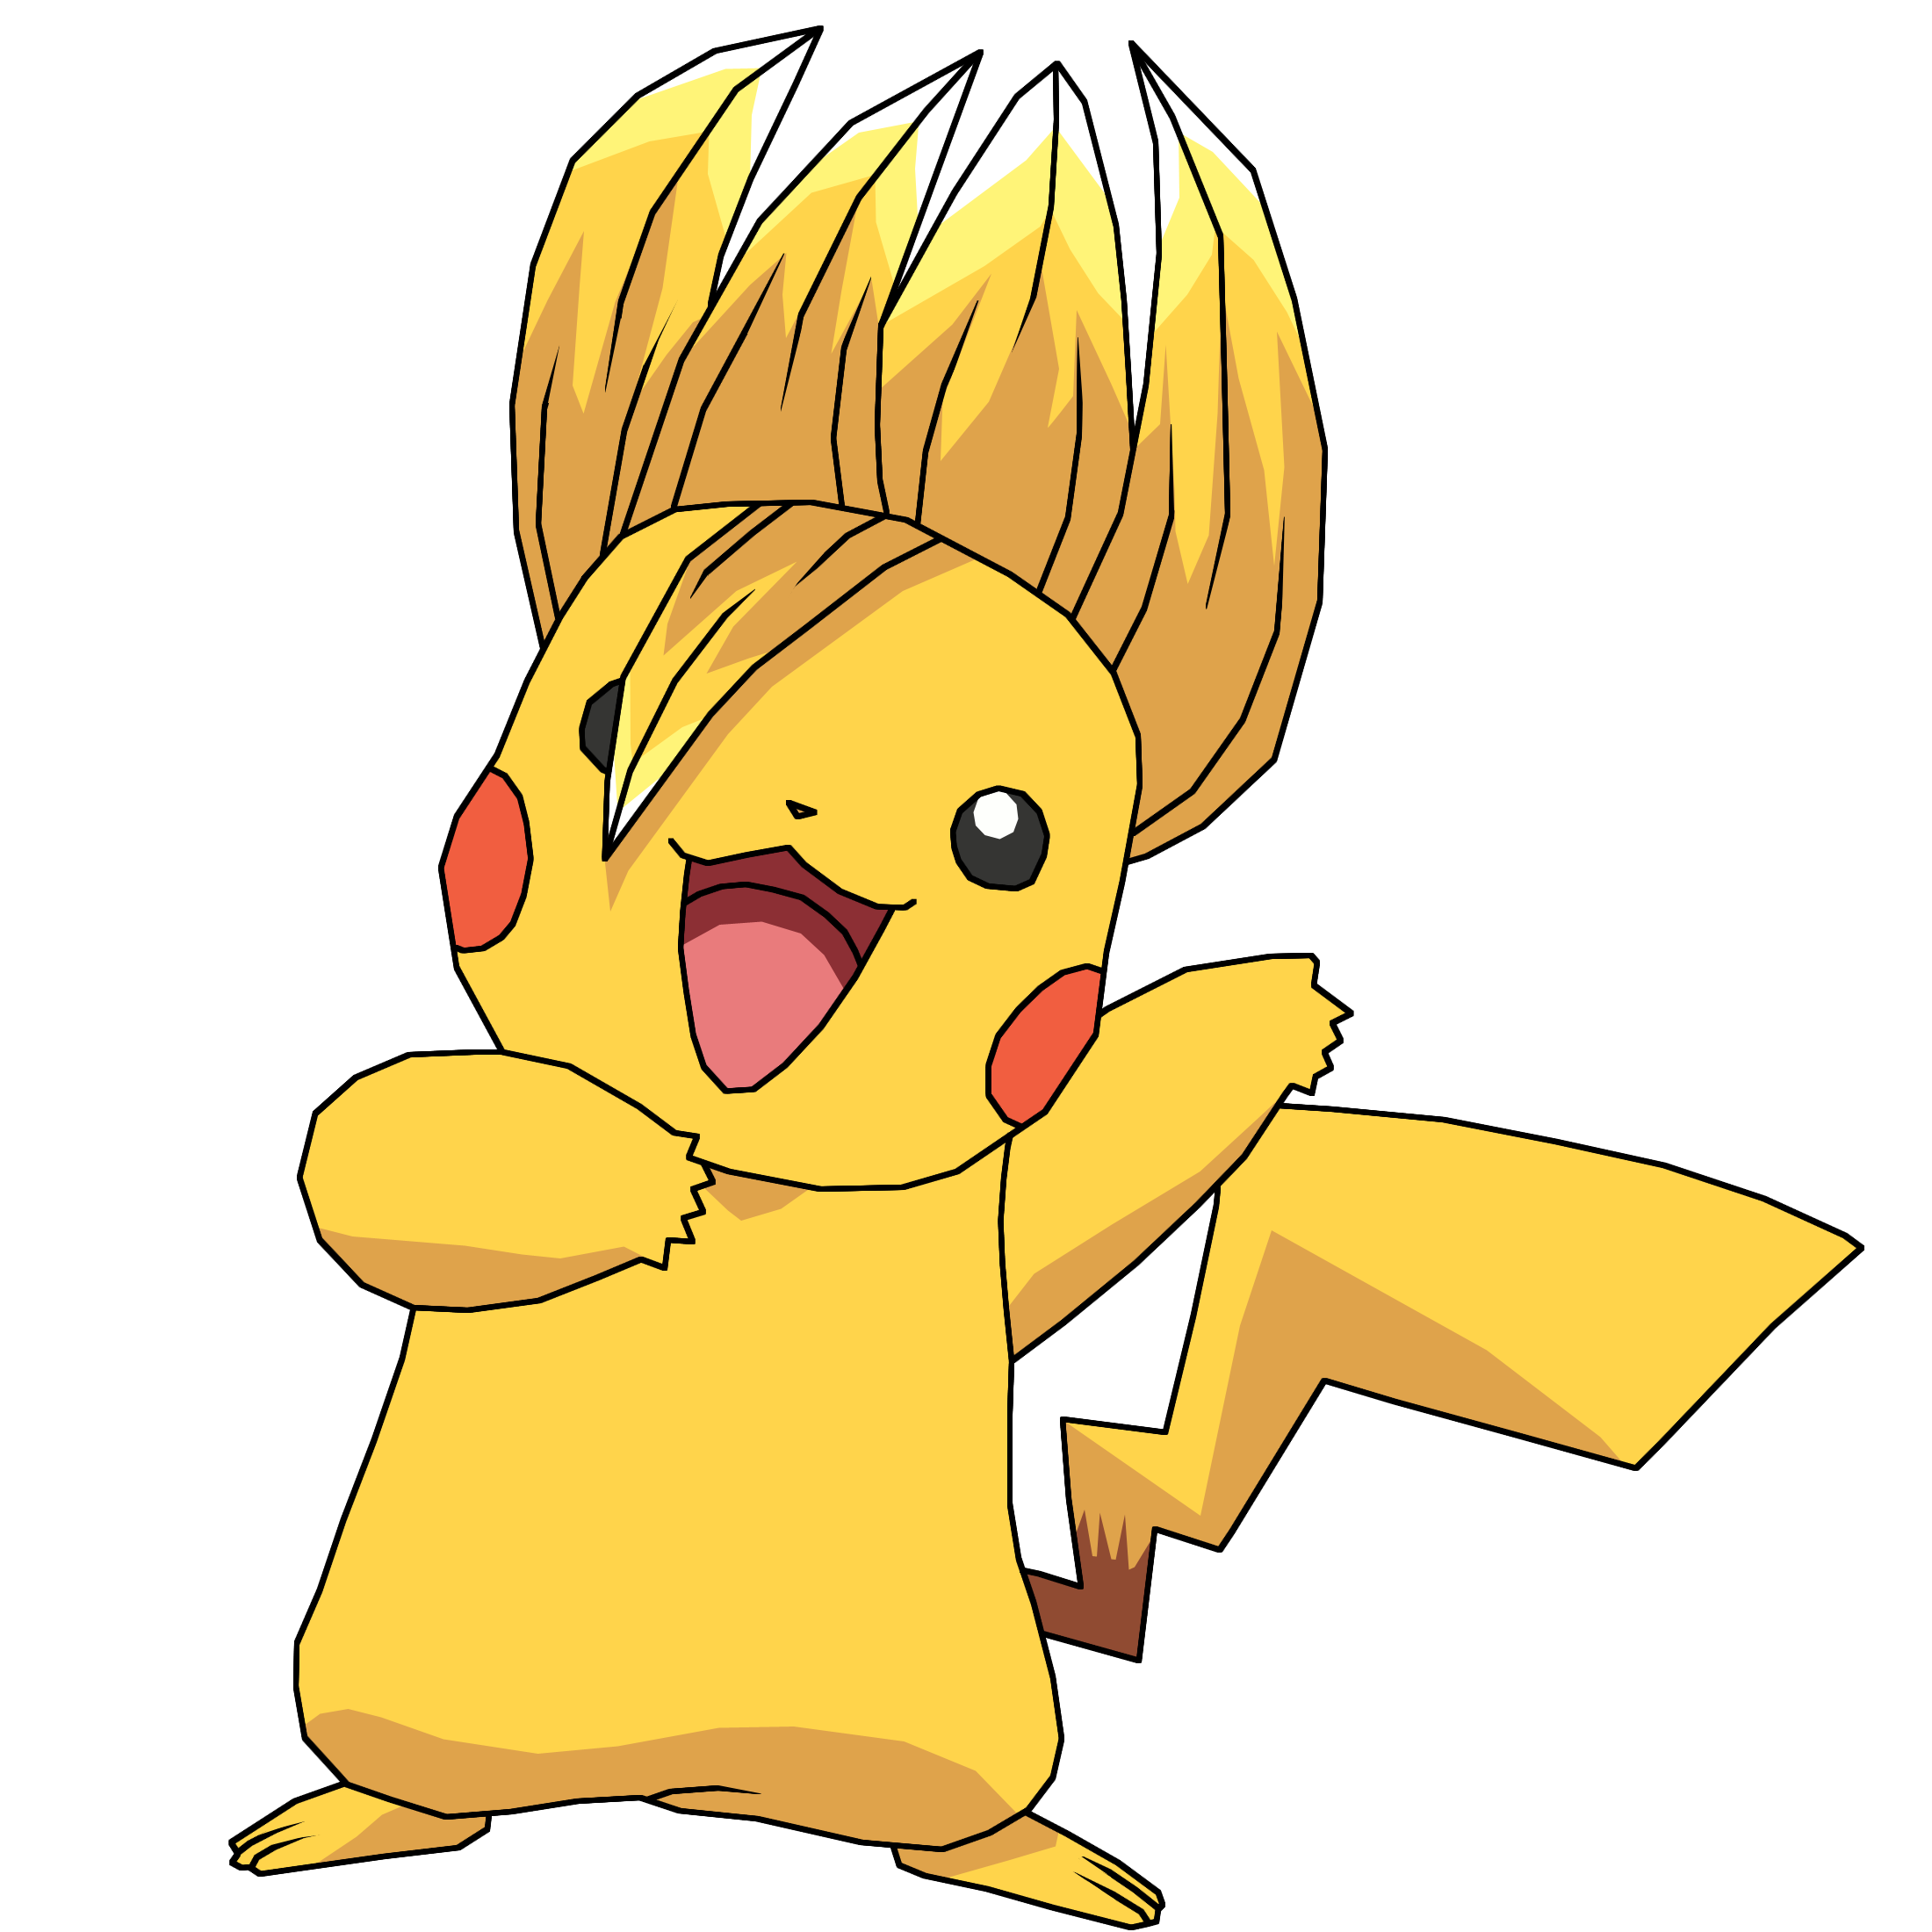 Shy clipart standing. Dragonball z and pikachu